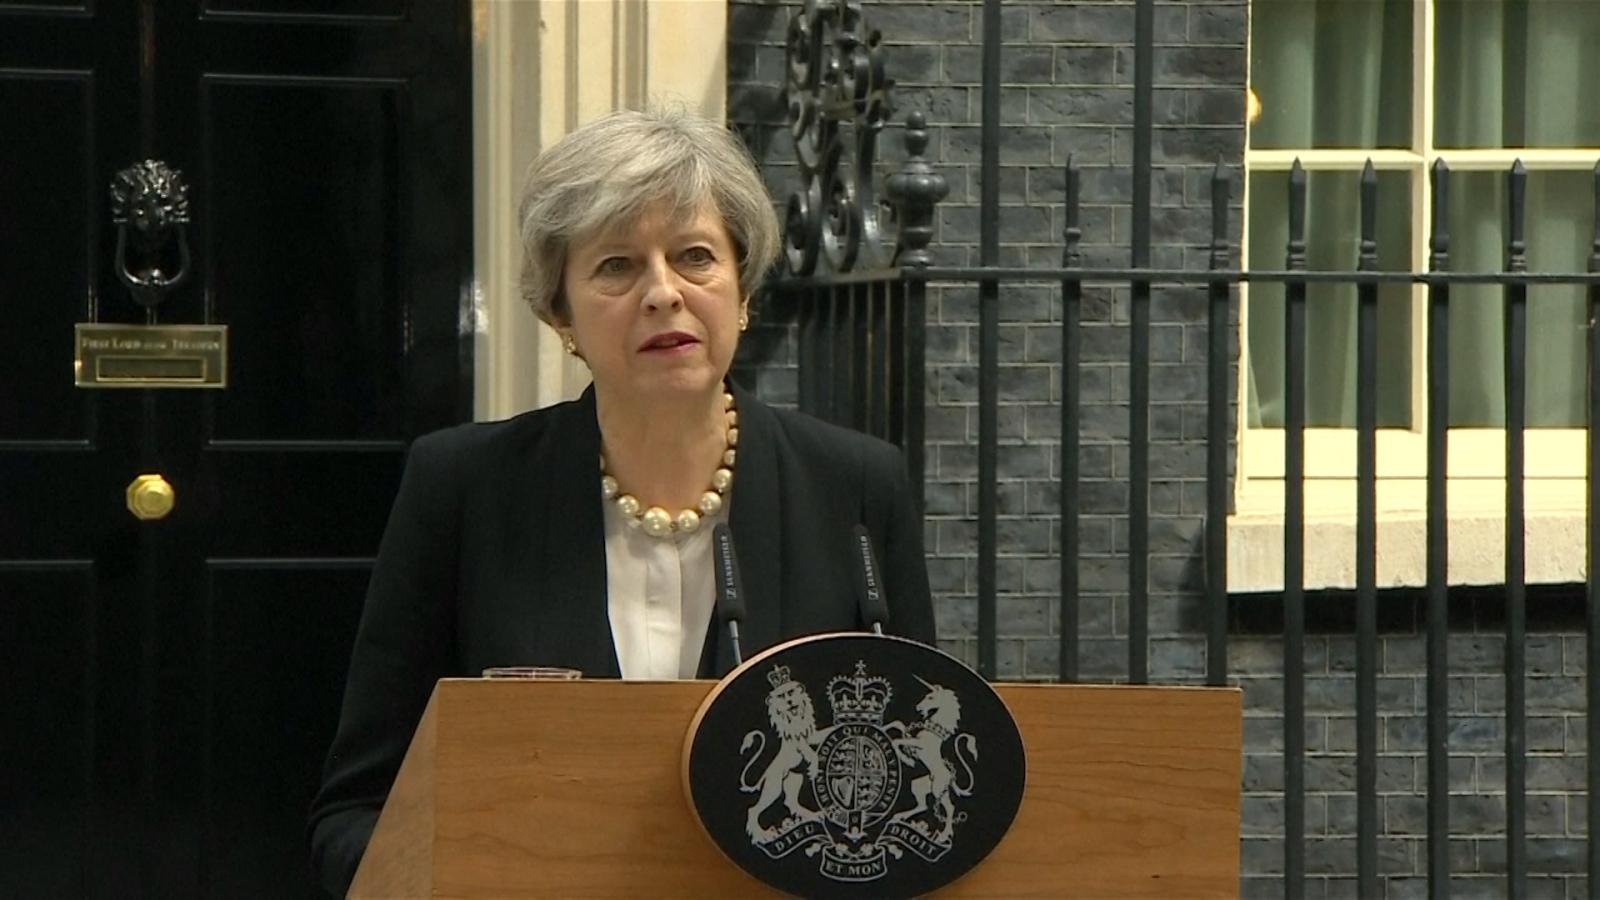 u-k-prime-minister-may-condemns-callous-terrorist-attack-in-manchester